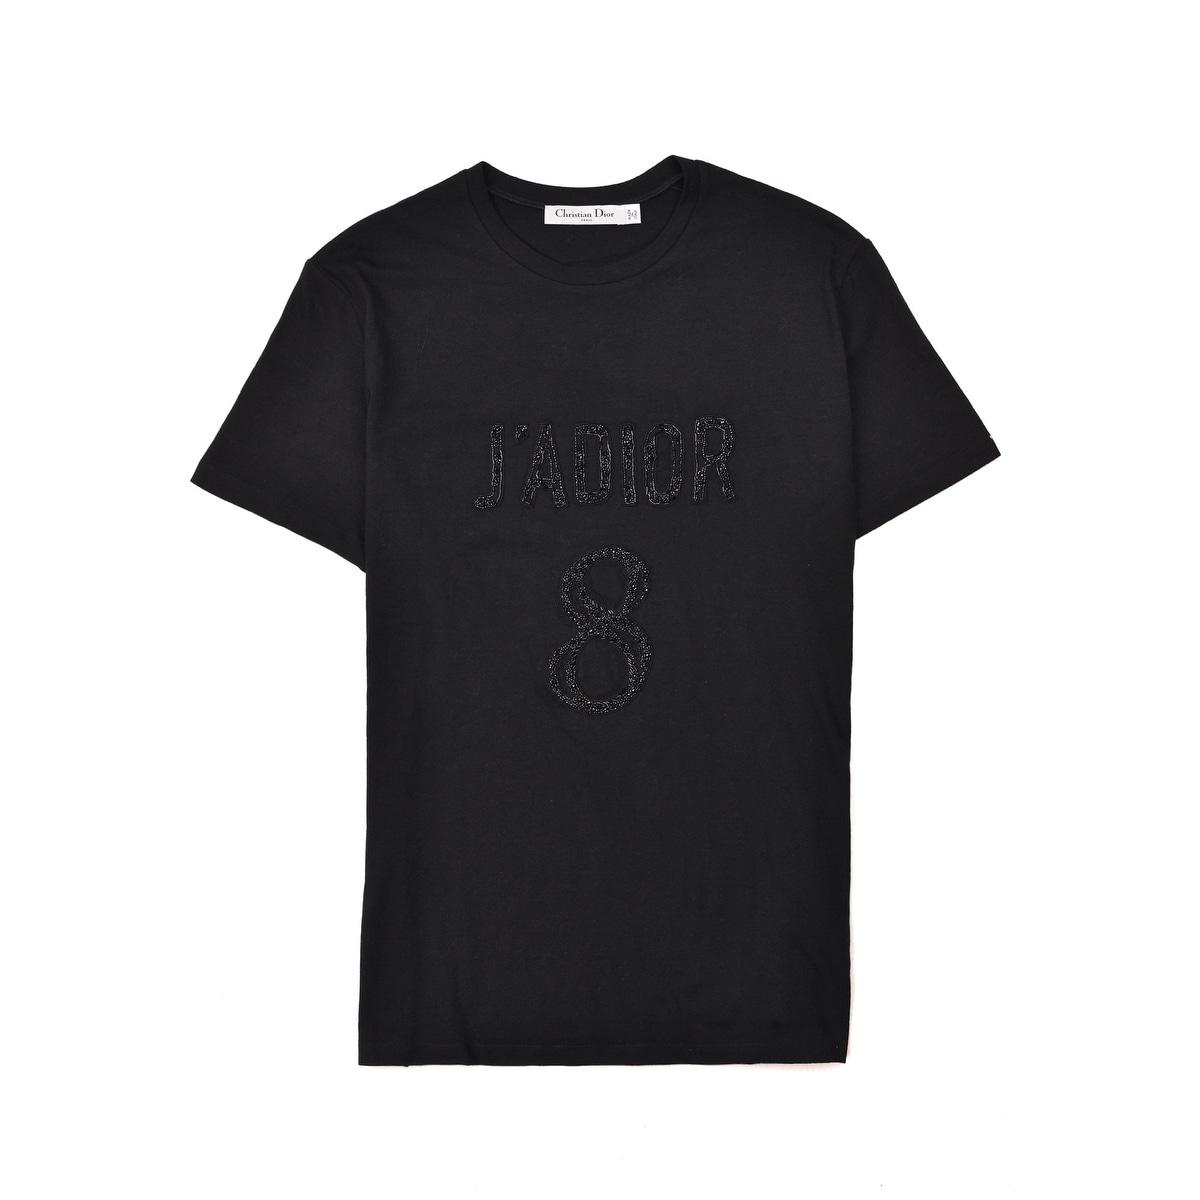 7198361f Shop Dior Womens Black Cotton Blend J'Adior 8 Beaded T Shirt - Free ...